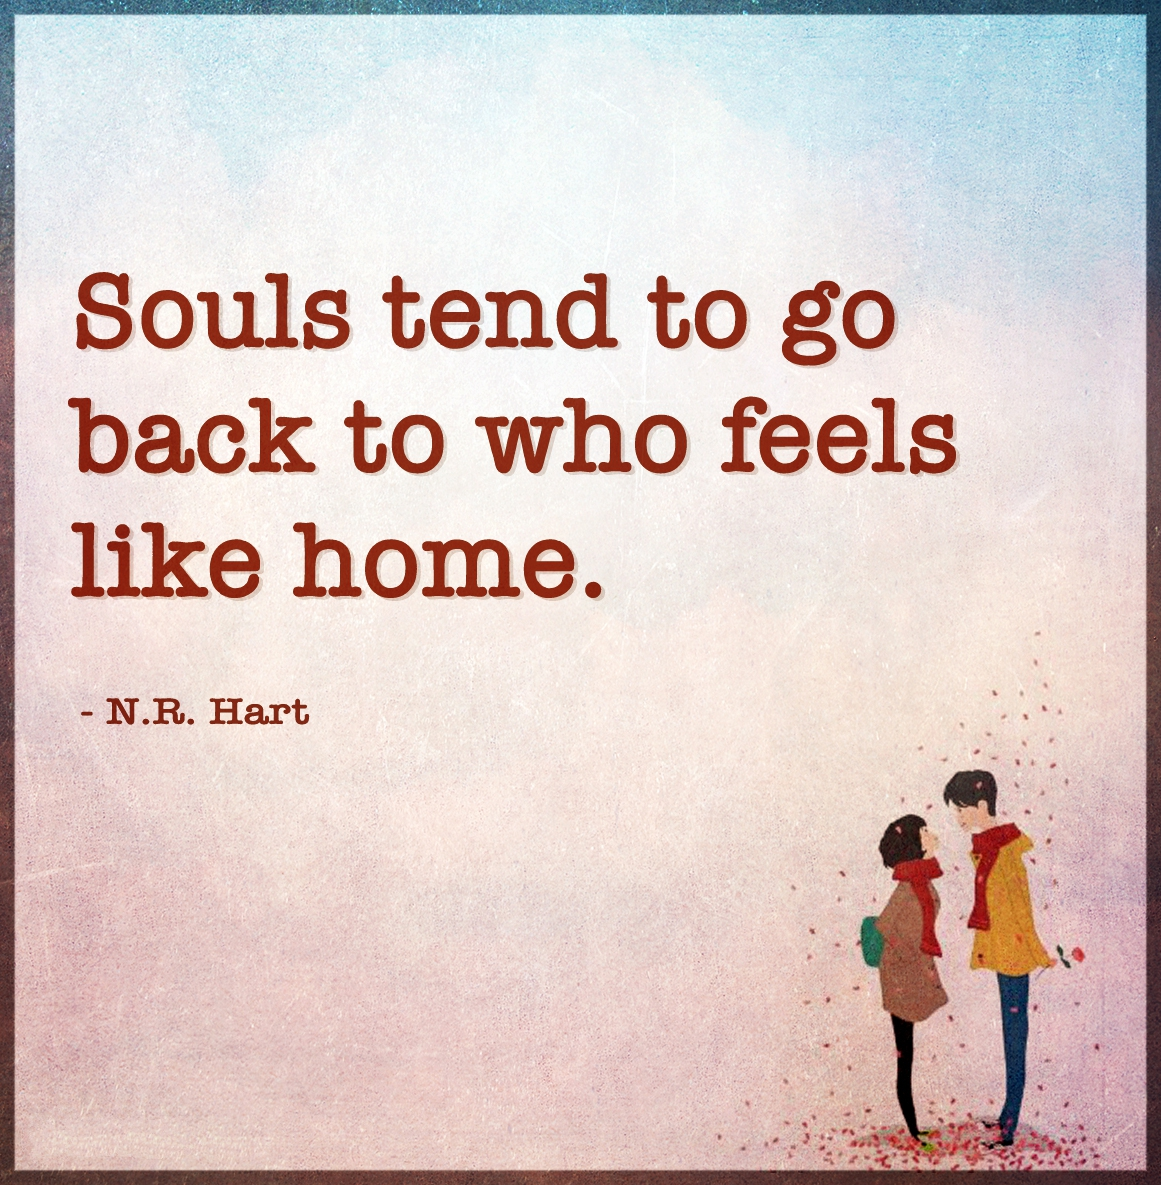 Souls tend to go back to who feels like home.